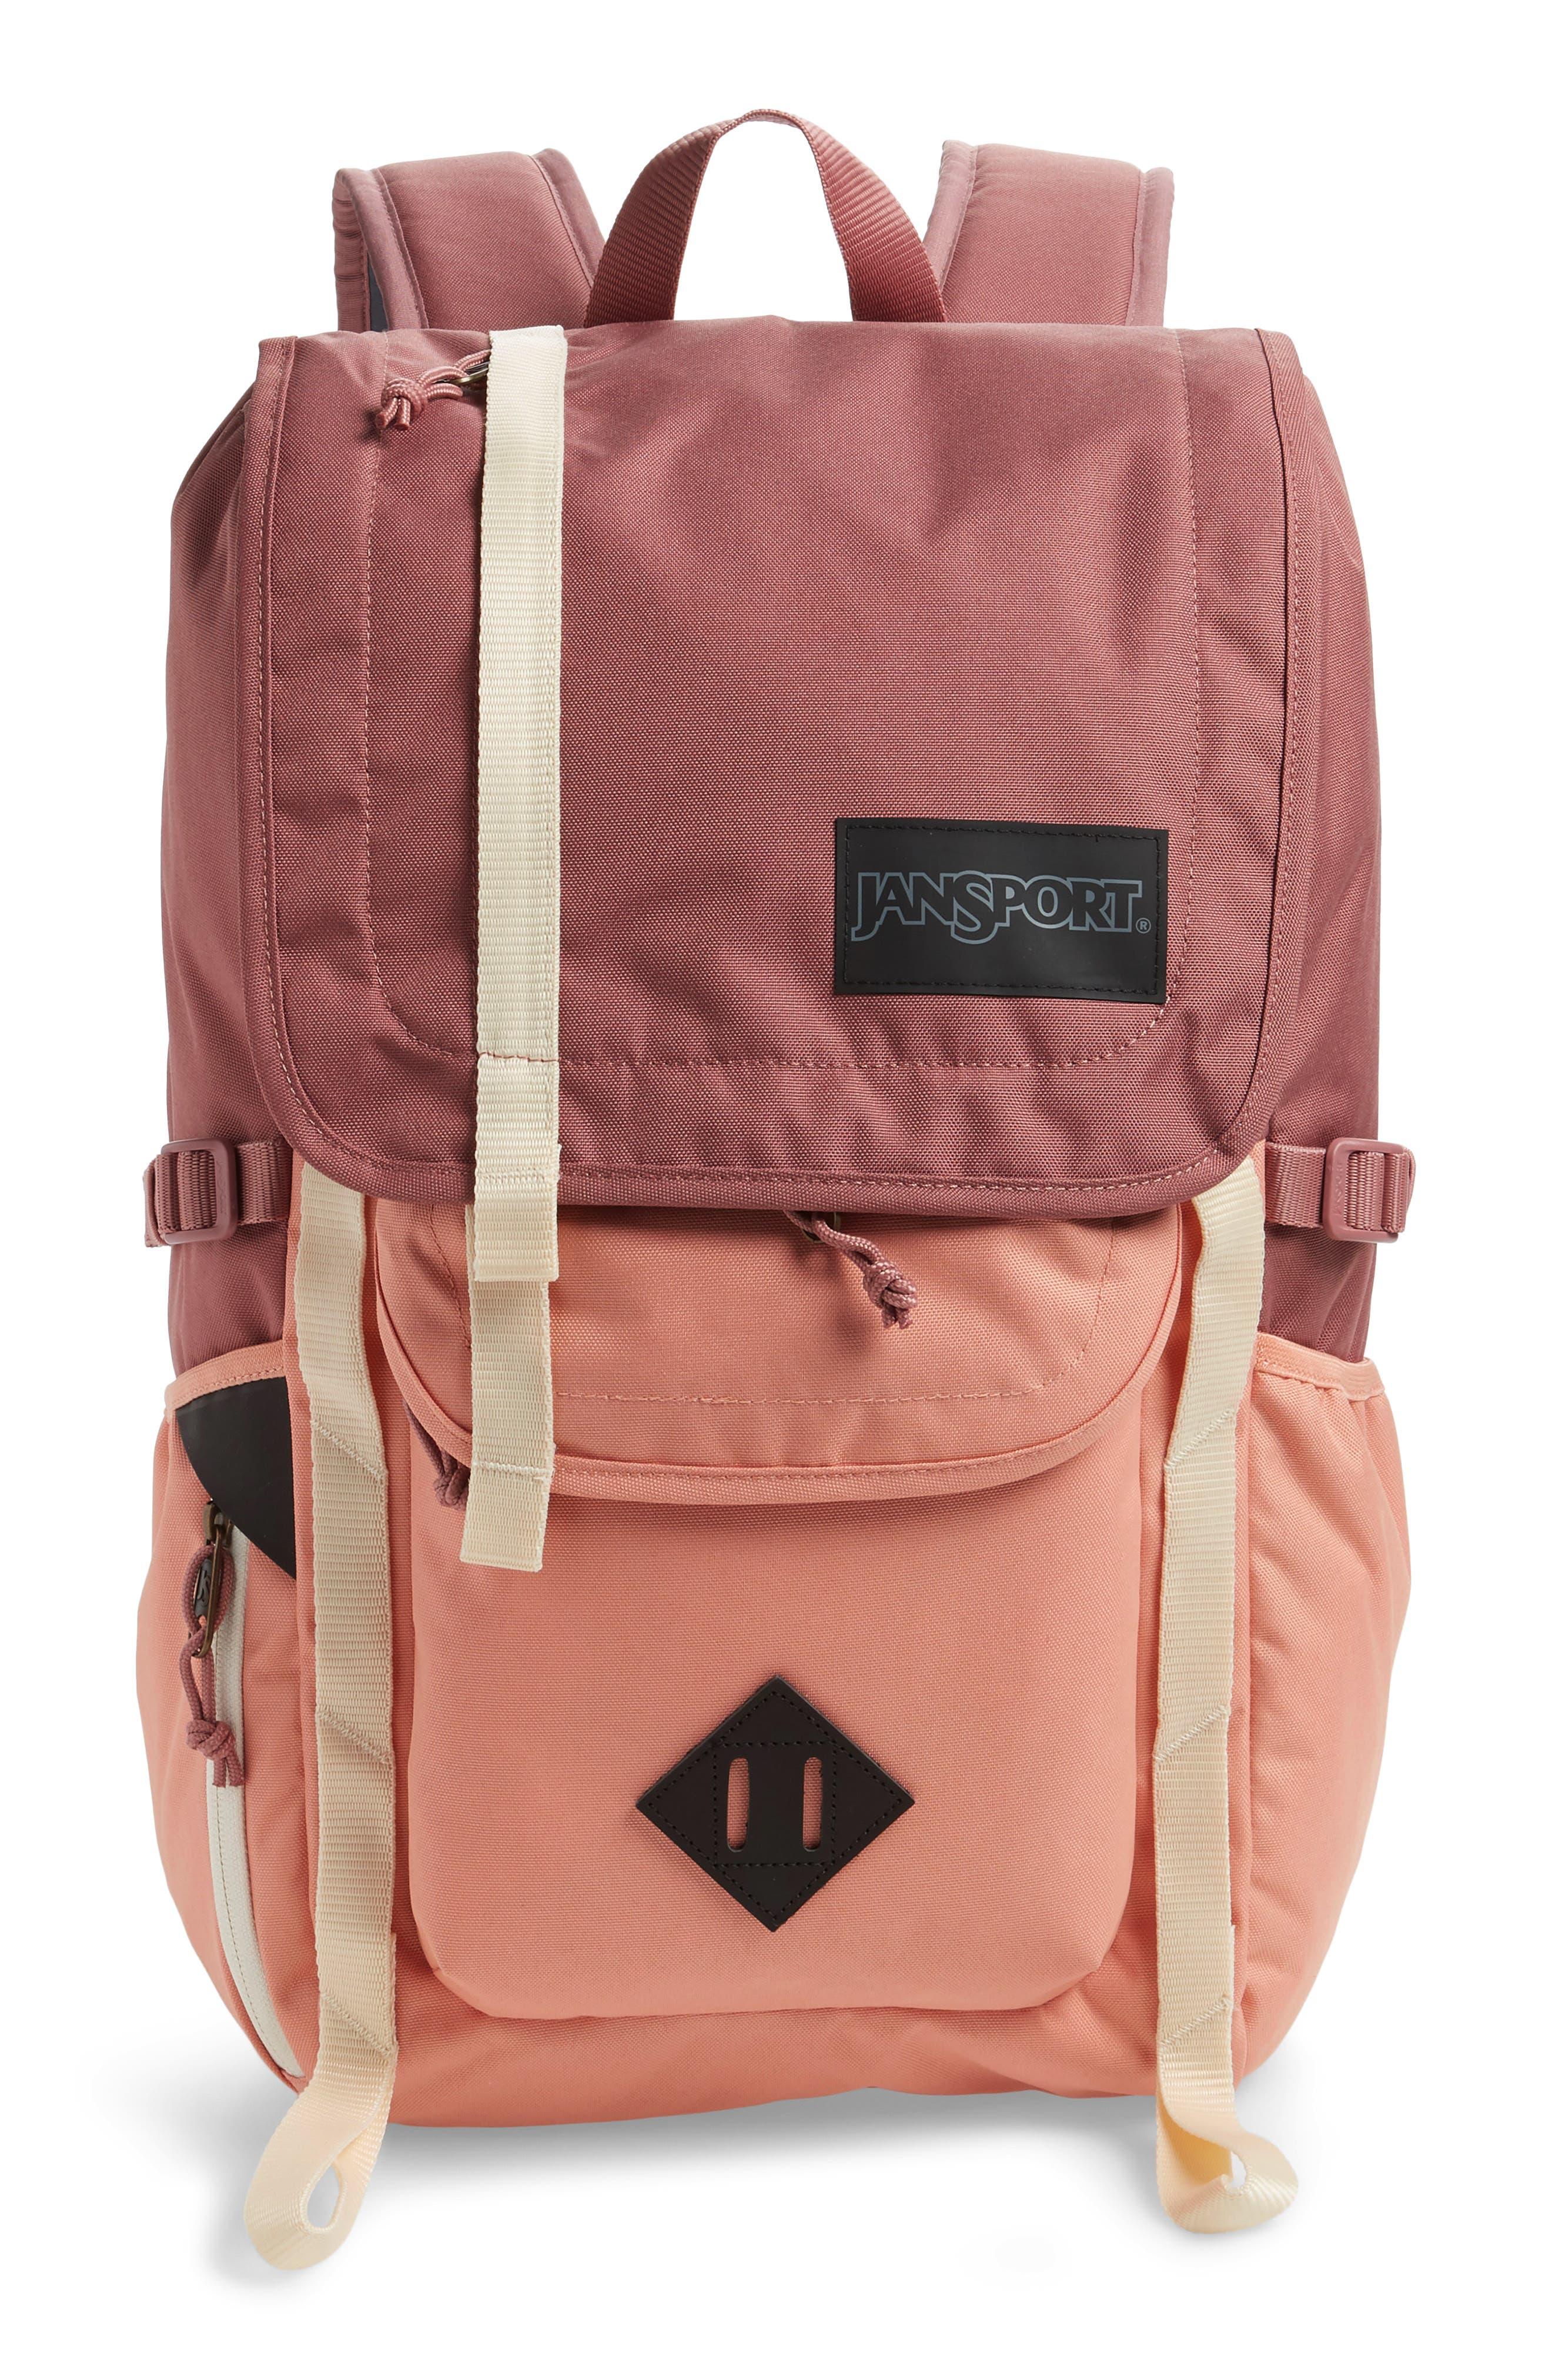 JANSPORT Hatchet Backpack, Main, color, MOCHA/ CLAY